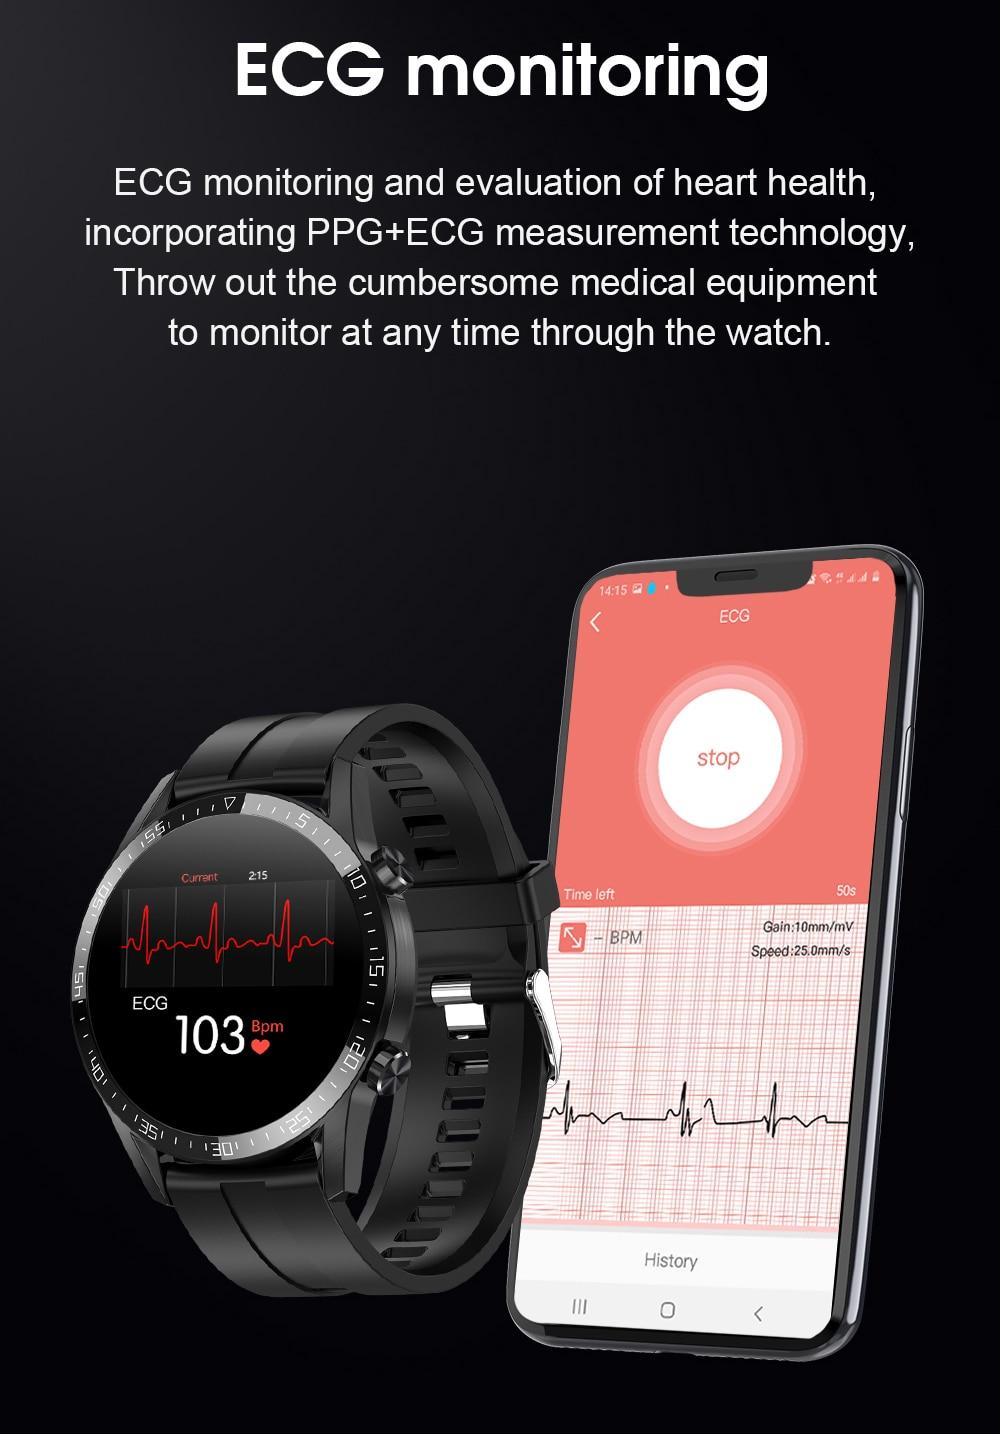 Hbe6bf577e26447569d51e9b4e3df7aedF IPbzhe Smart Watch Men Thermometer ECG Smart Watch IP68 Waterproof Blood Pressure Smartwatch Reloj Inteligente For Huawei Xiaomi